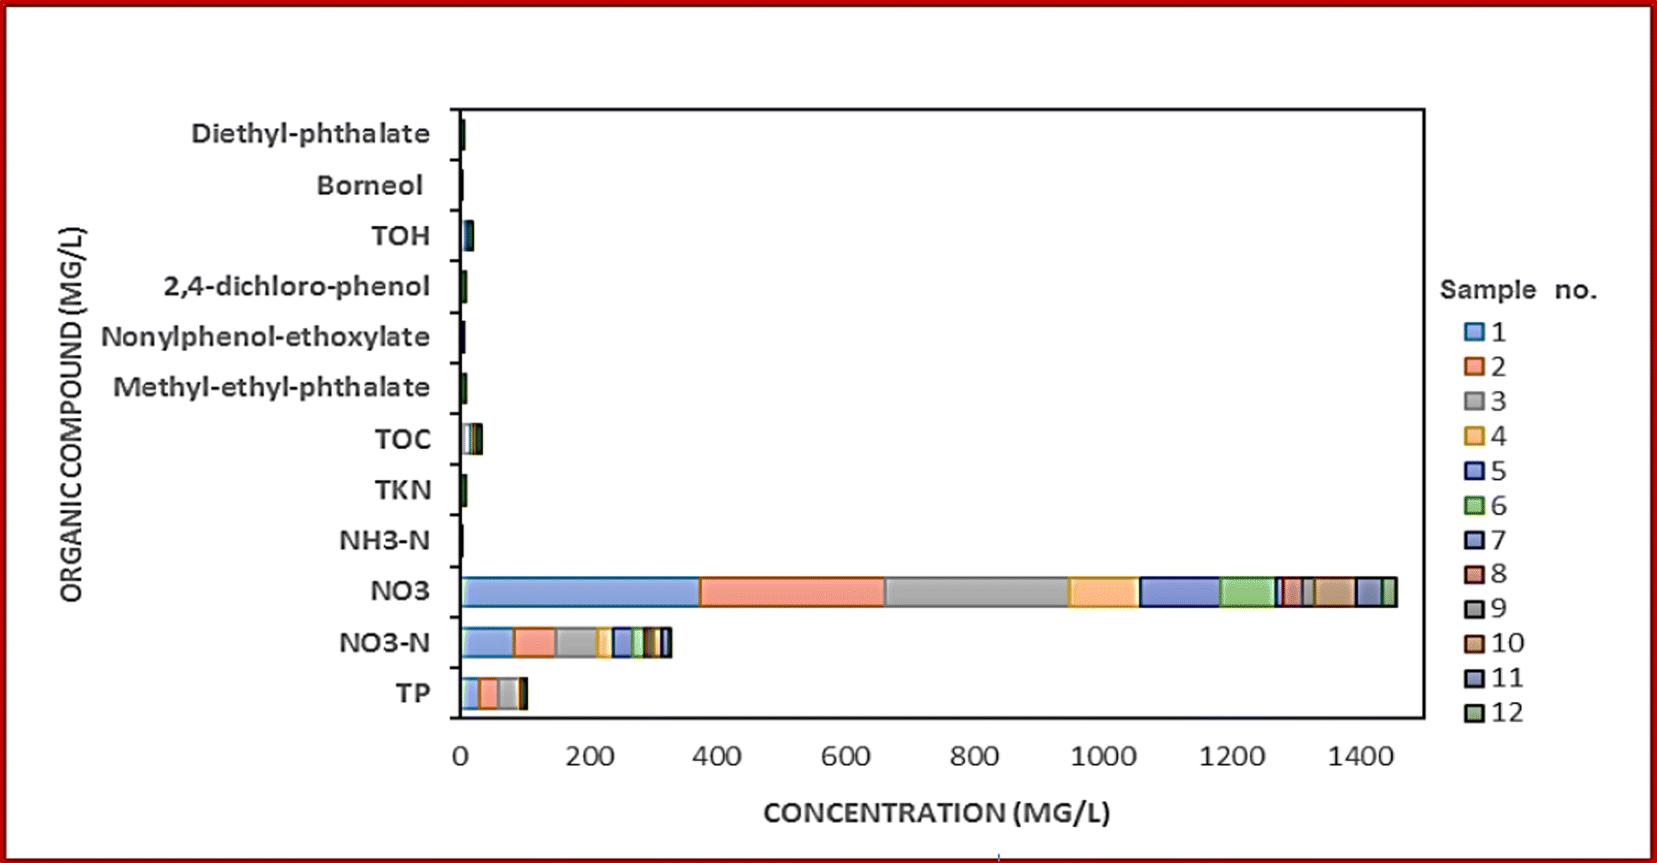 Impact of organic contaminants from dumpsite leachates on